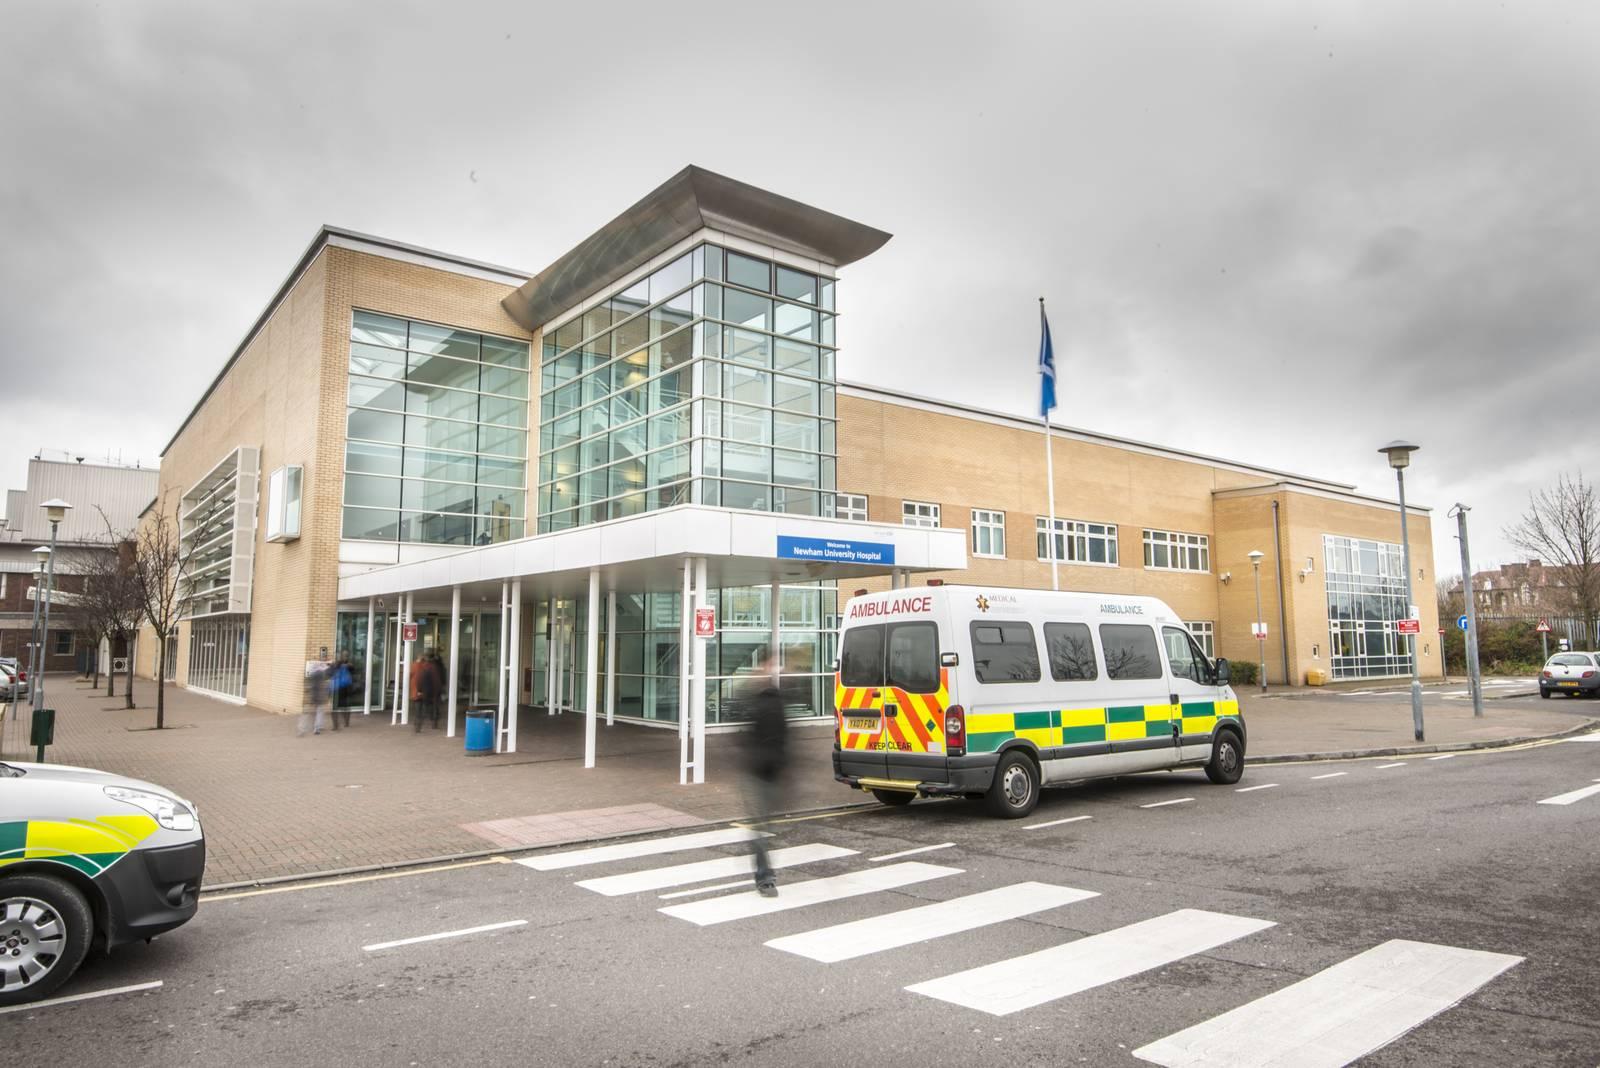 Newham University Hospital - Barts Health NHS Trust